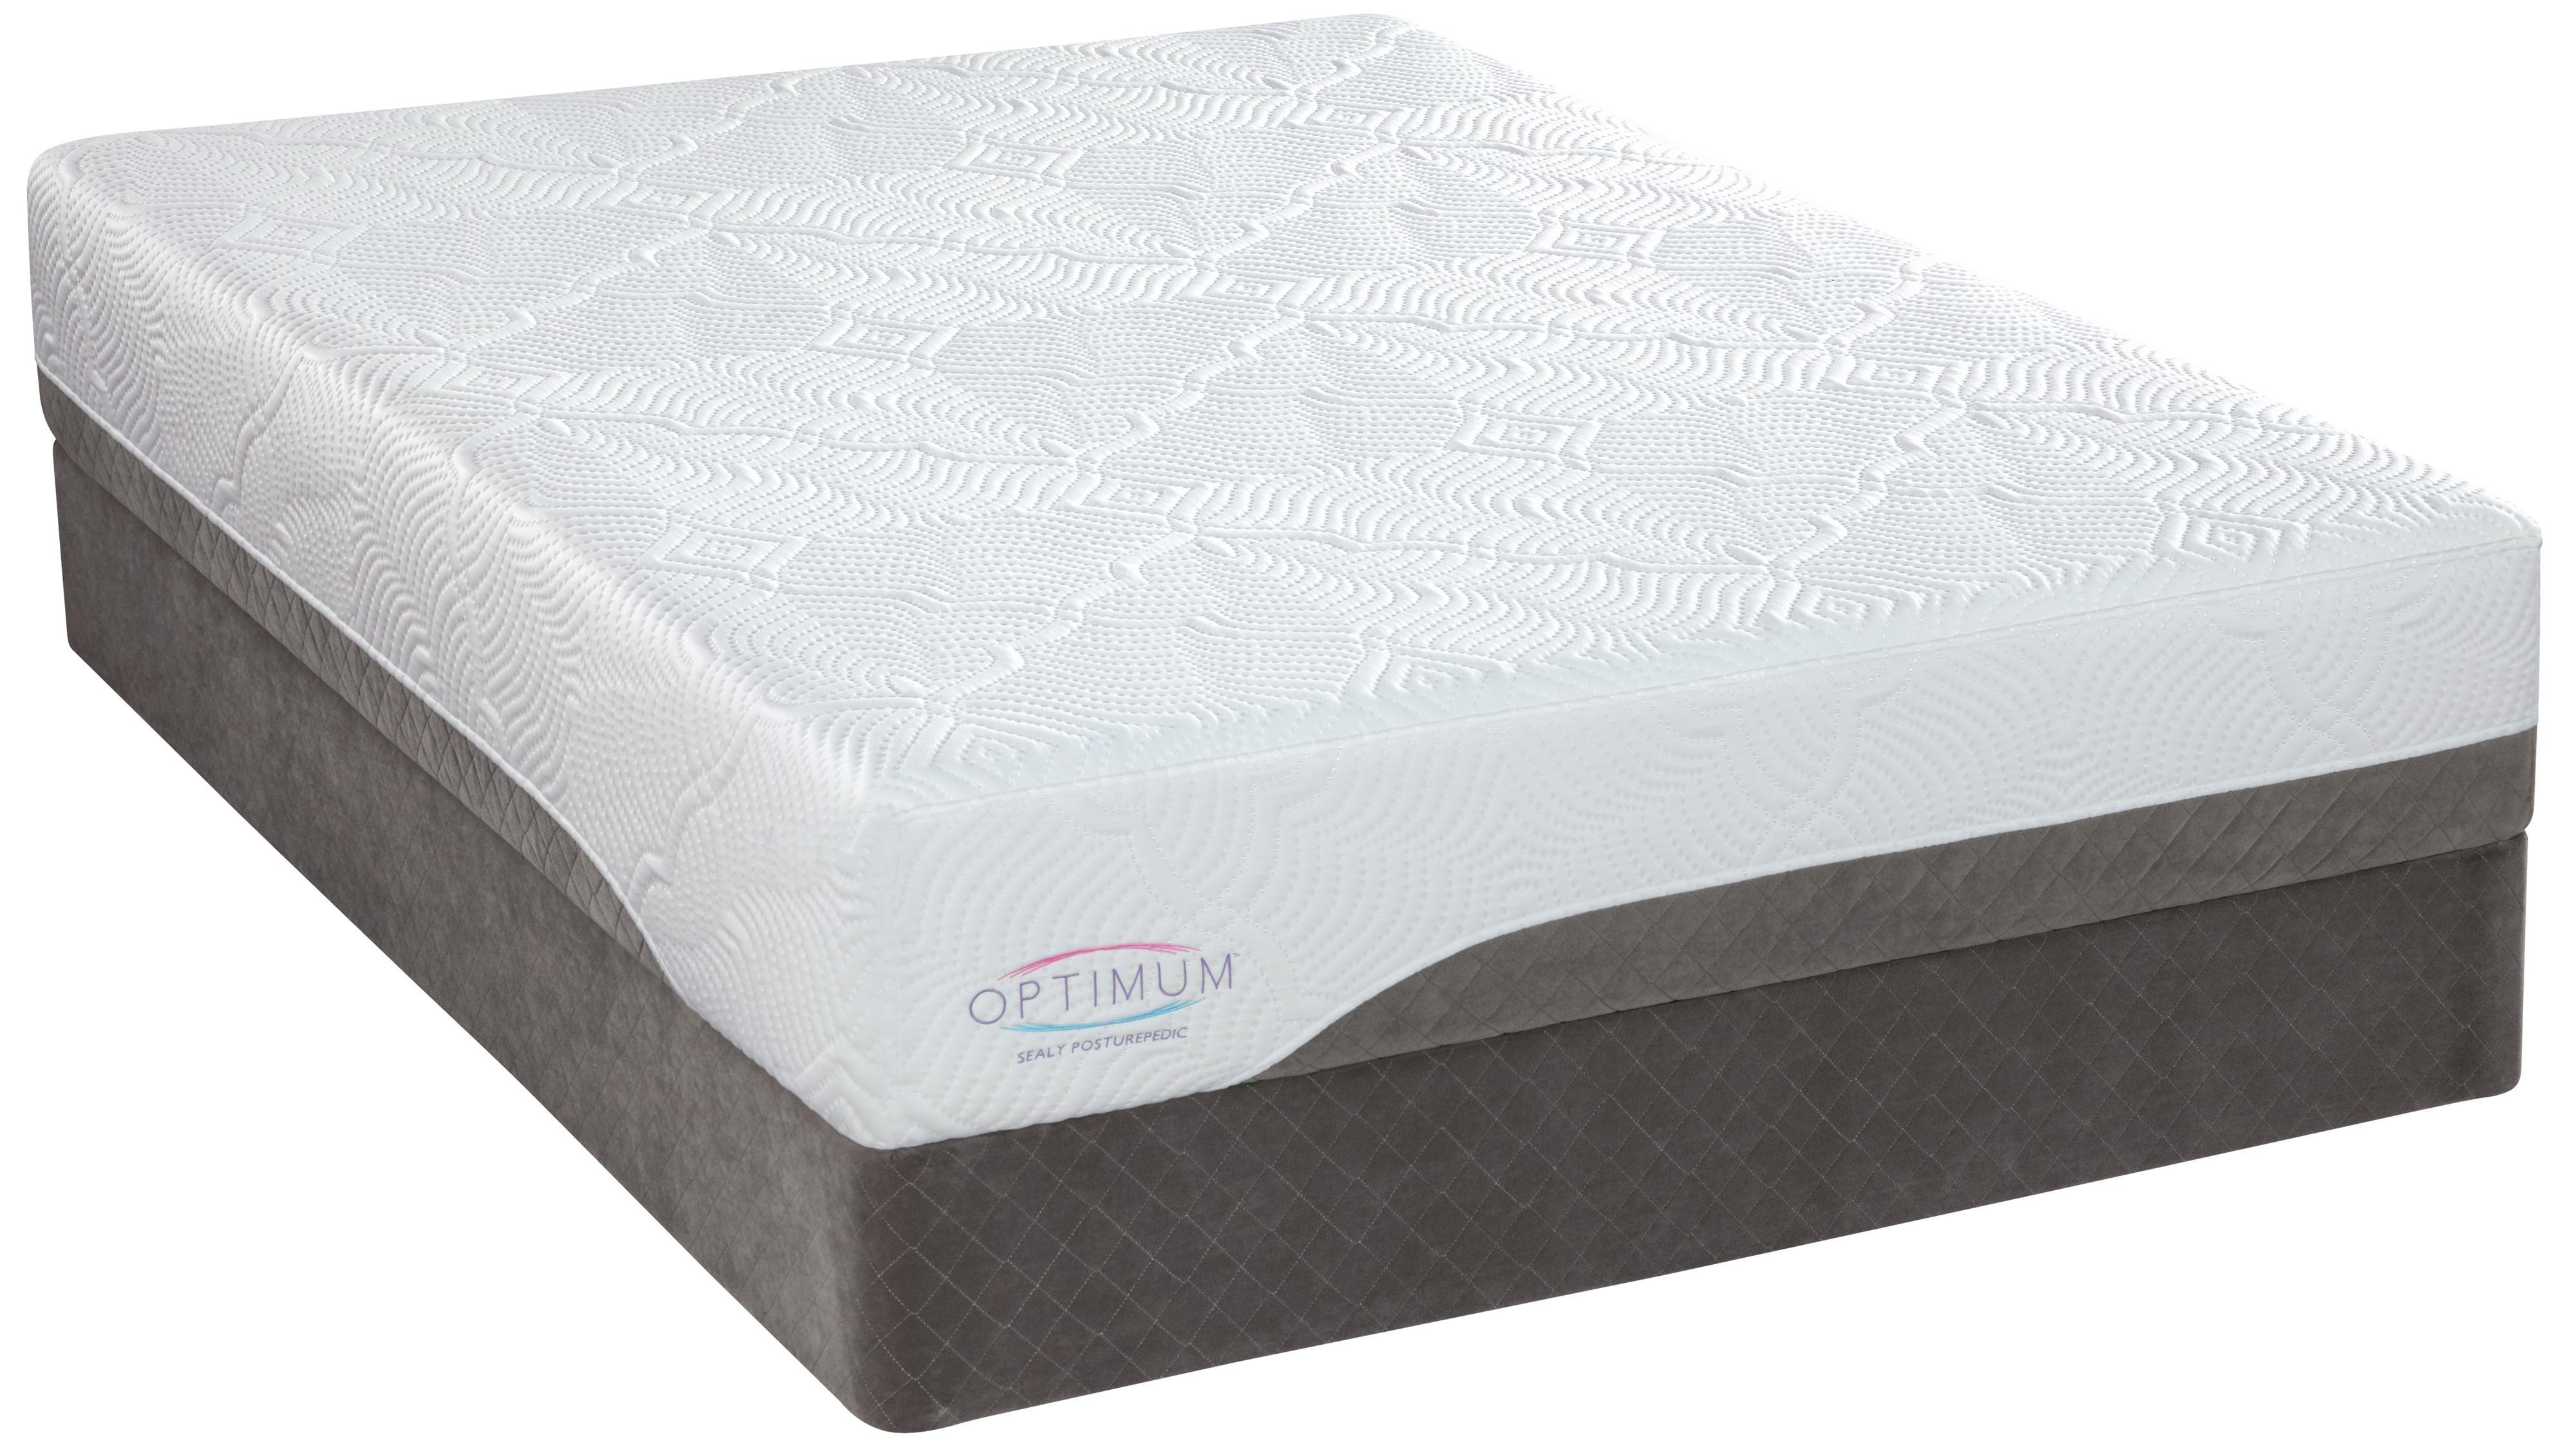 Sealy Optimum Latex Gel Meadowcrest Full Latex Mattress Set - Item Number: 508220F+617719F